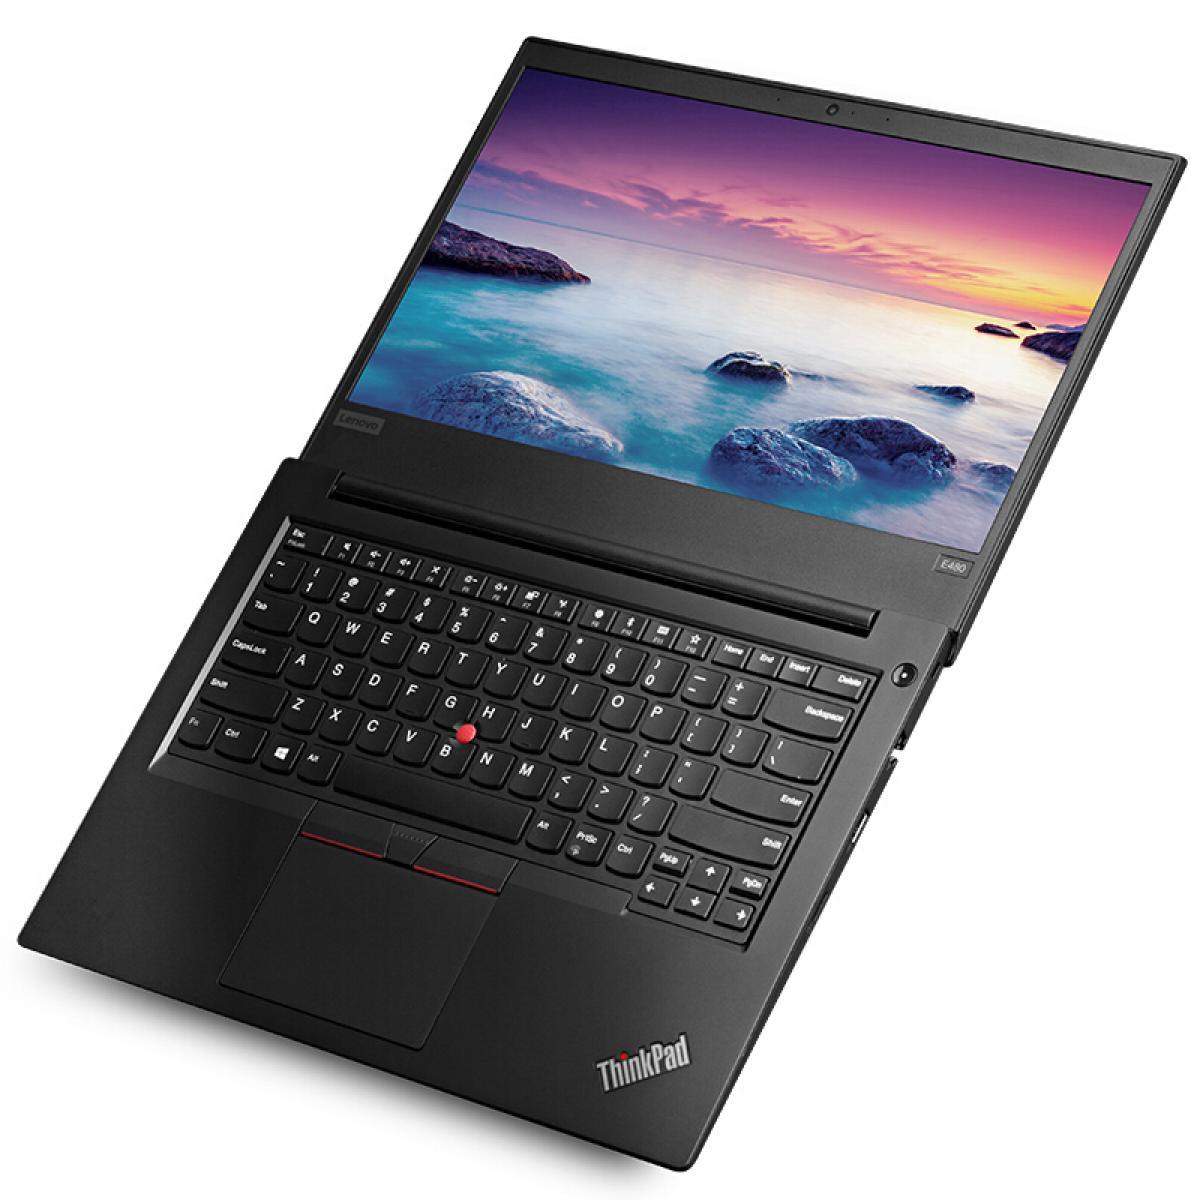 Lenovo ThinkPad Edge E490 Core i7 8Gen Full HD